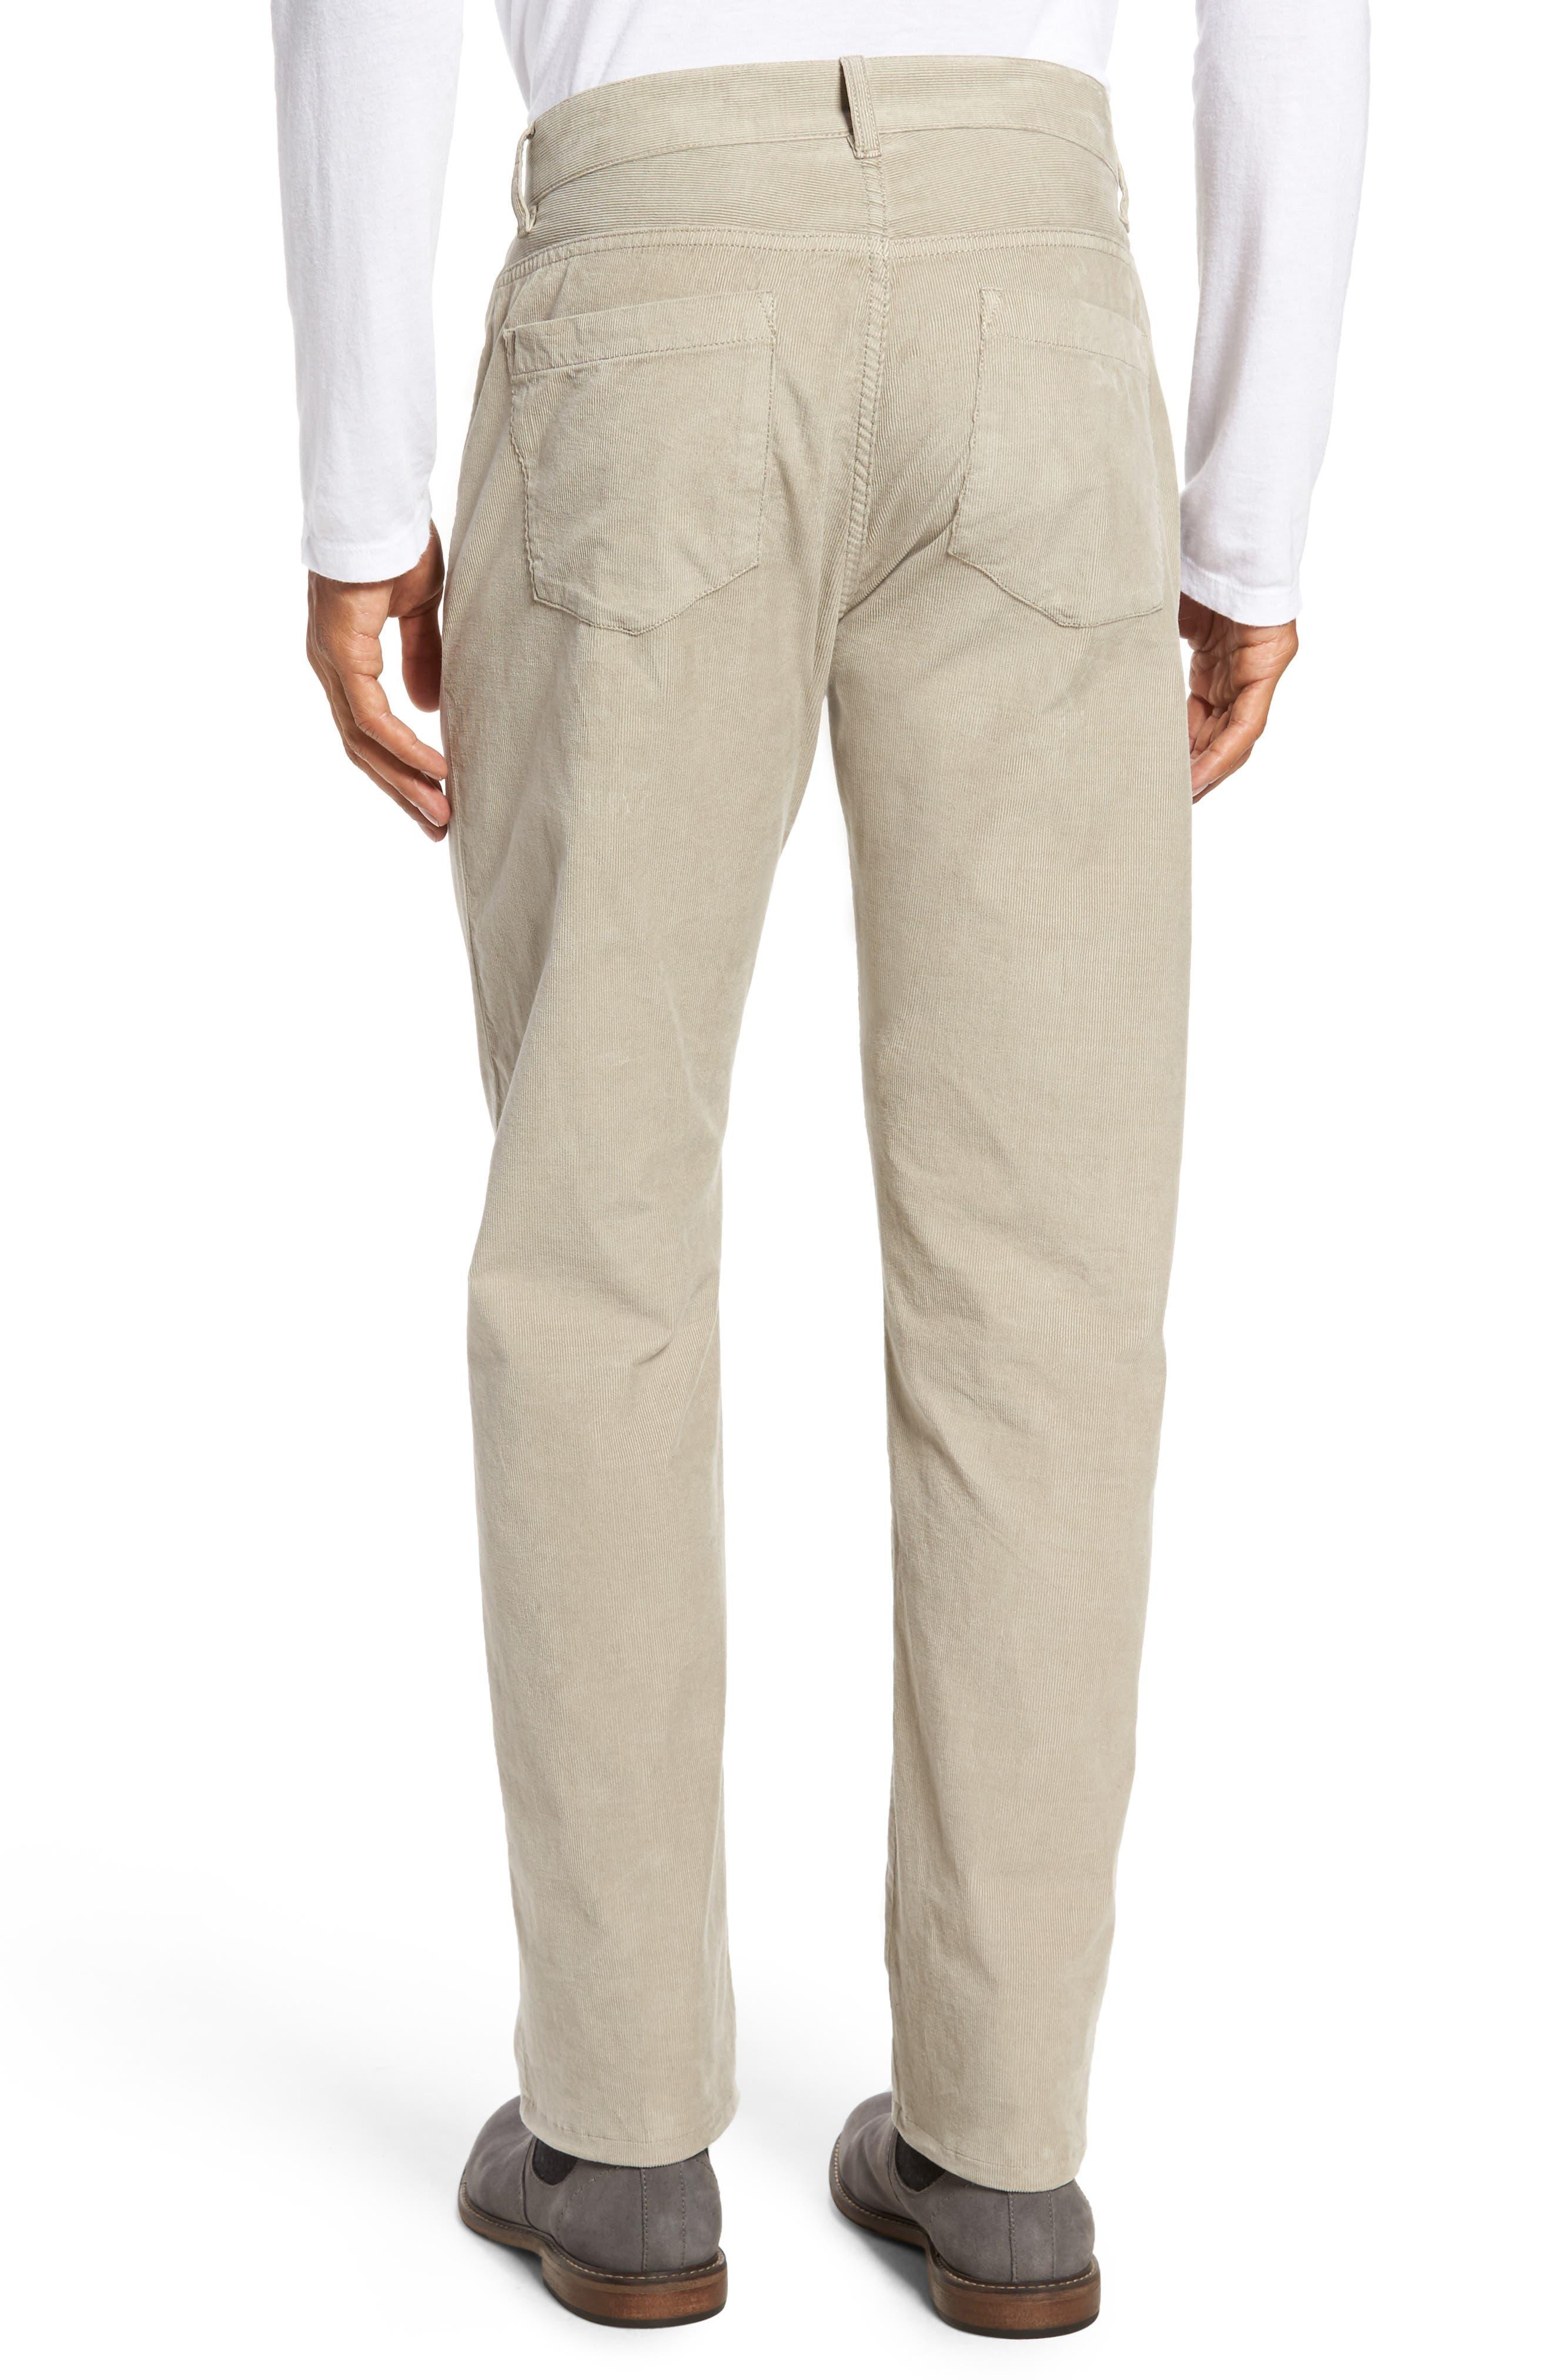 Redonda Stretch Corduroy Trousers,                             Alternate thumbnail 2, color,                             252